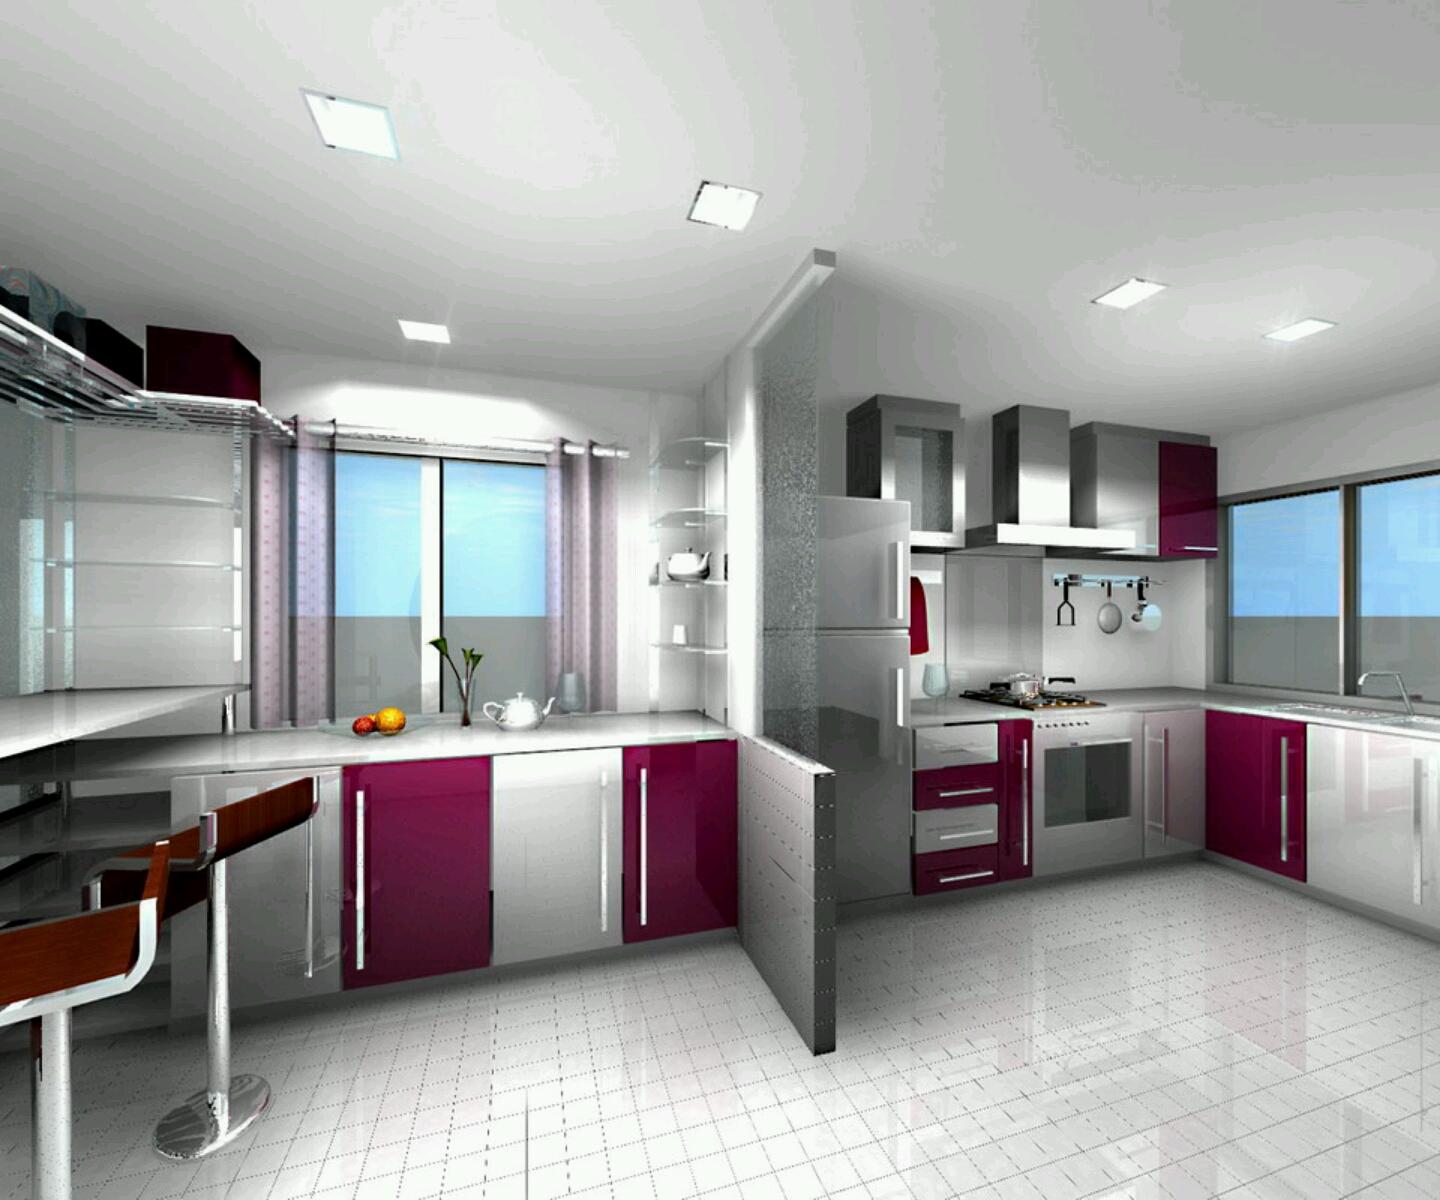 New home designs latest.: Modern homes ultra modern ... on Modern Kitchen Design Ideas  id=63886